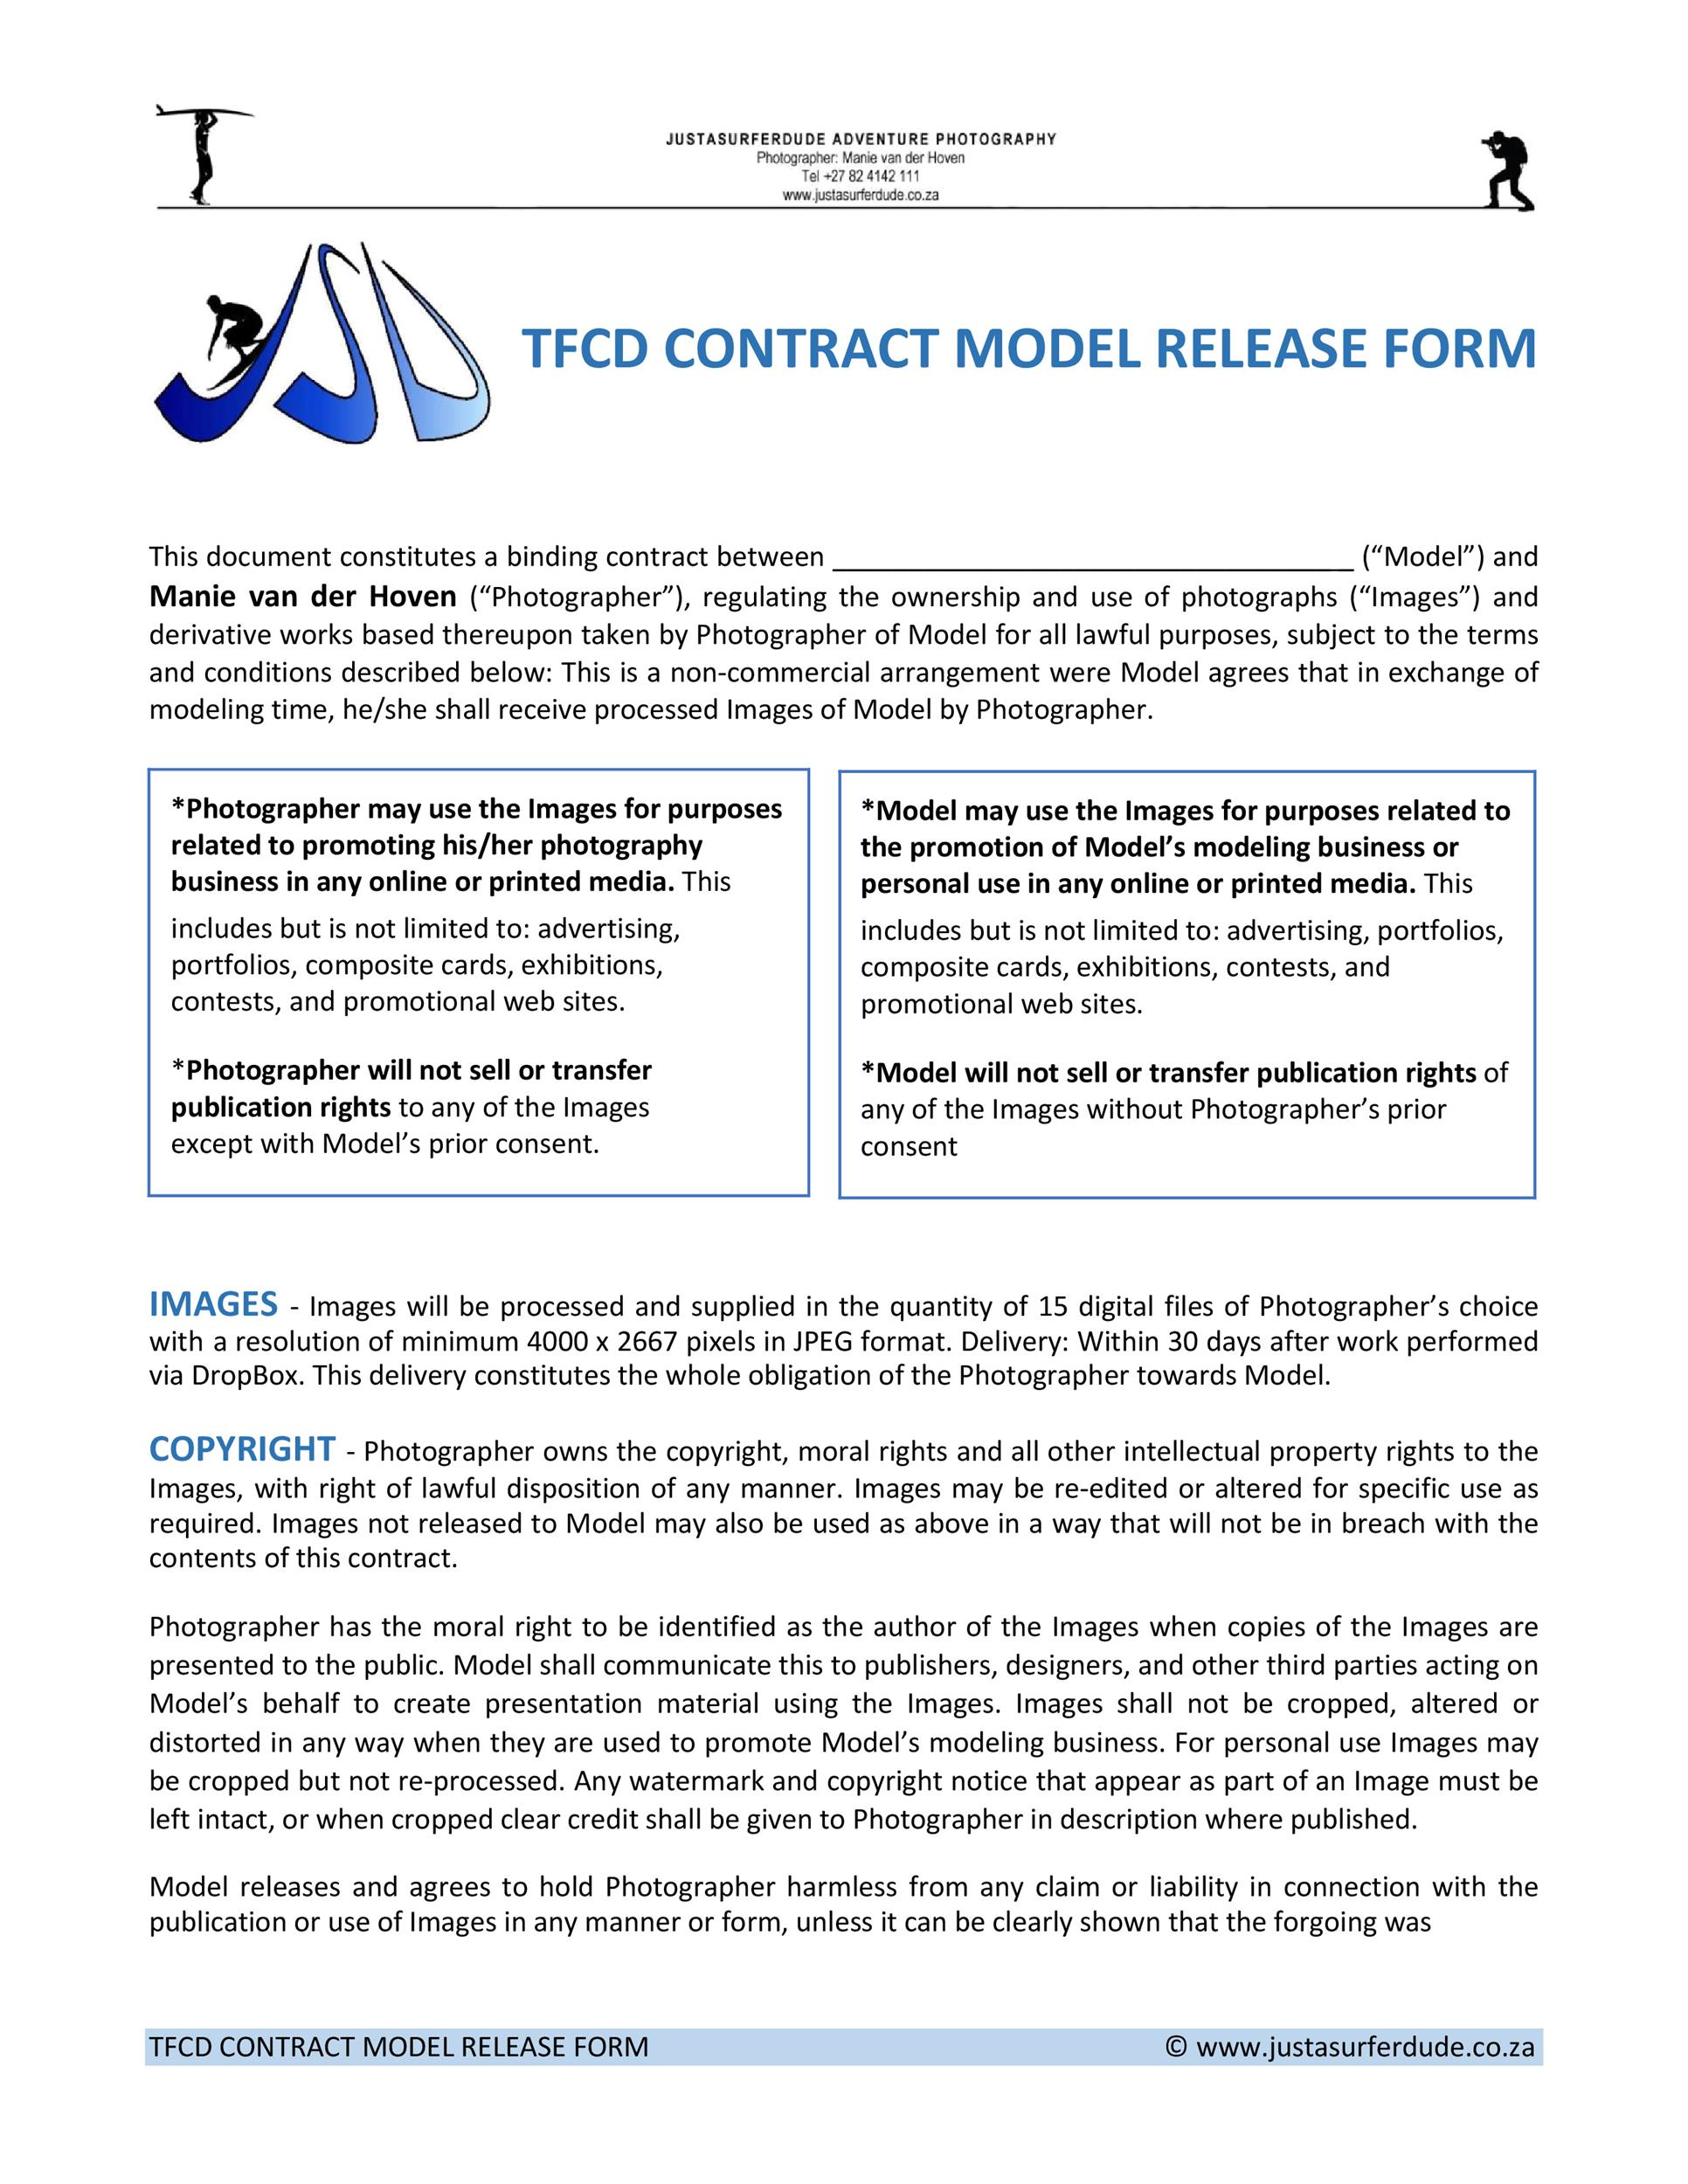 Free model release form 22